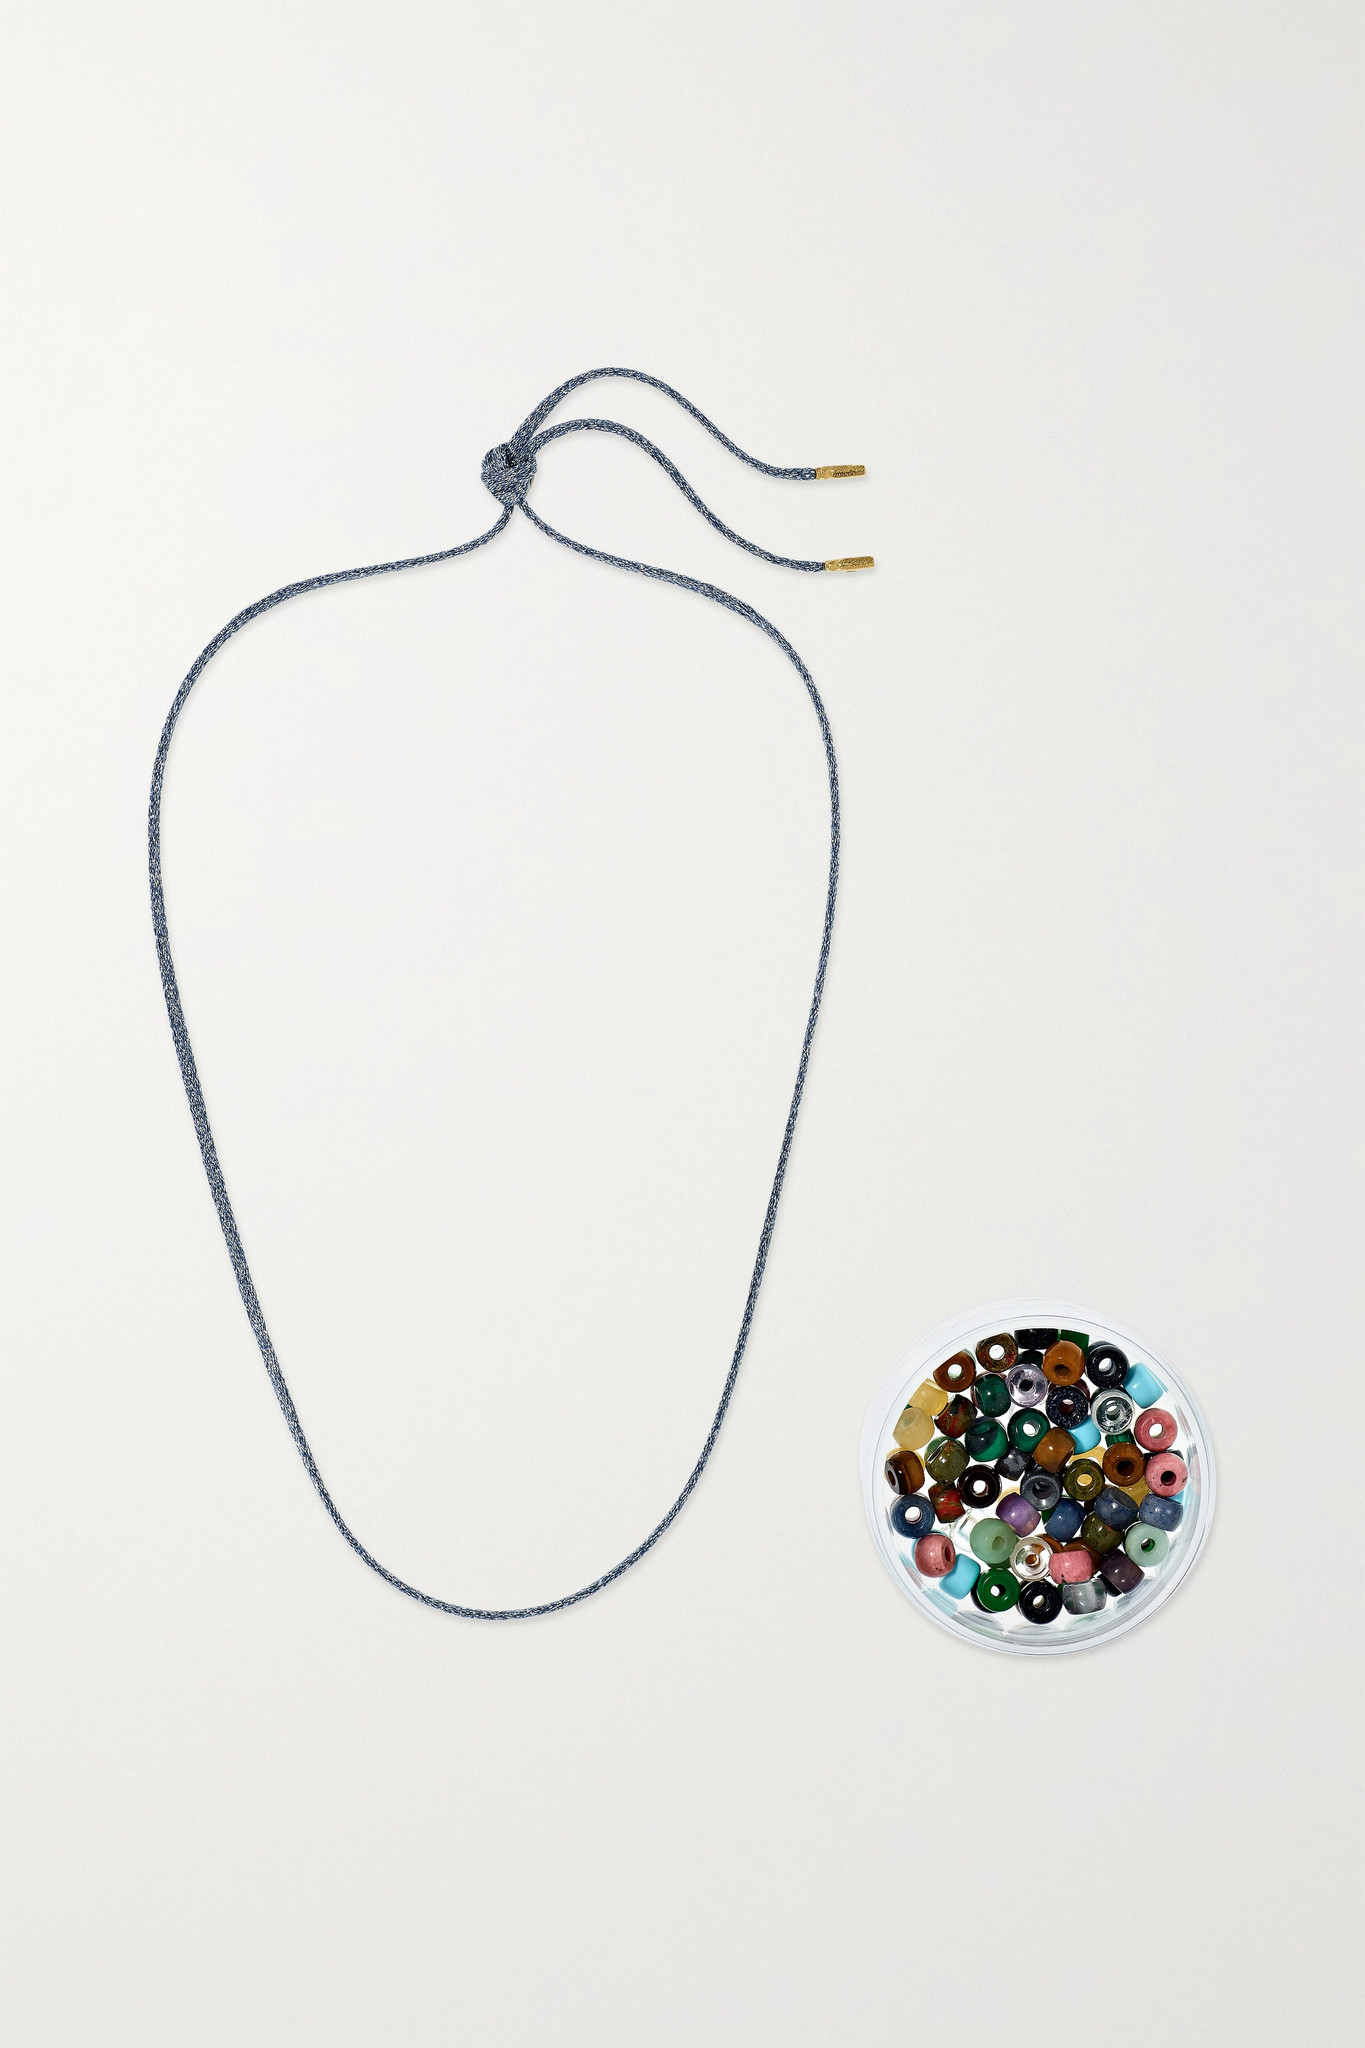 CAROLINA BUCCI - Forte Beads 18-karat Gold And Lurex Multi-stone Necklace Kit - Metallic - one size